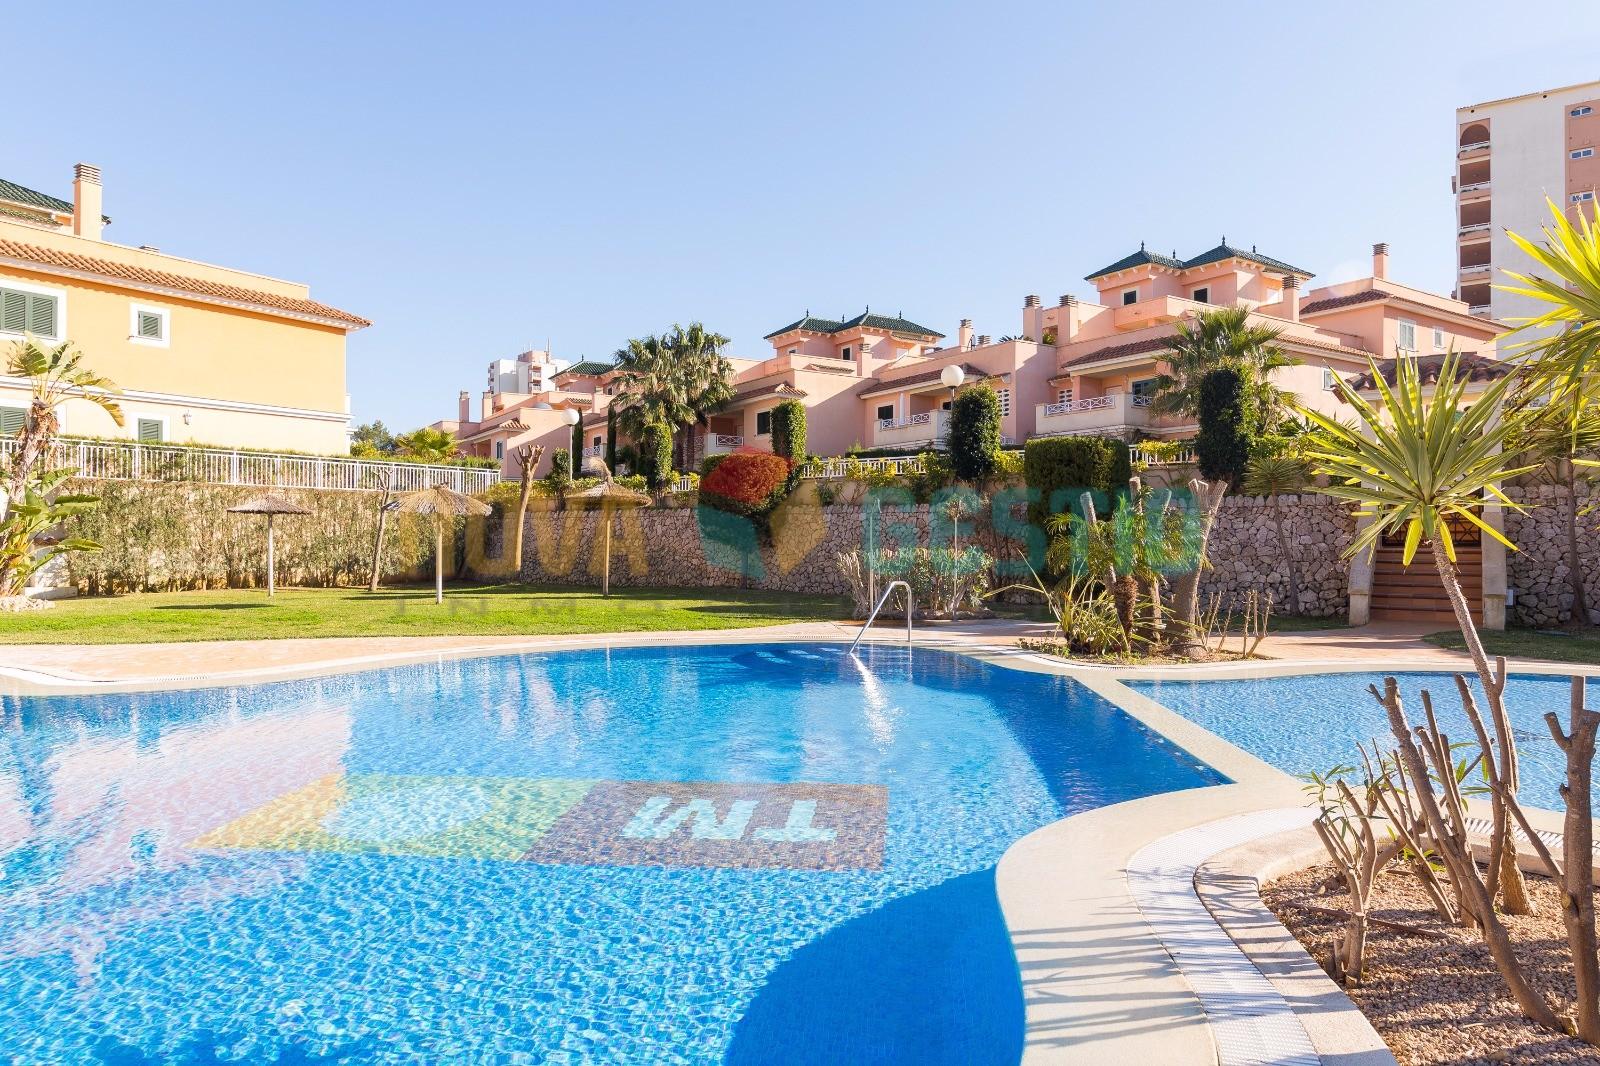 Dúplex en alquiler en Calas de Mallorca : : DU676CDM-AES